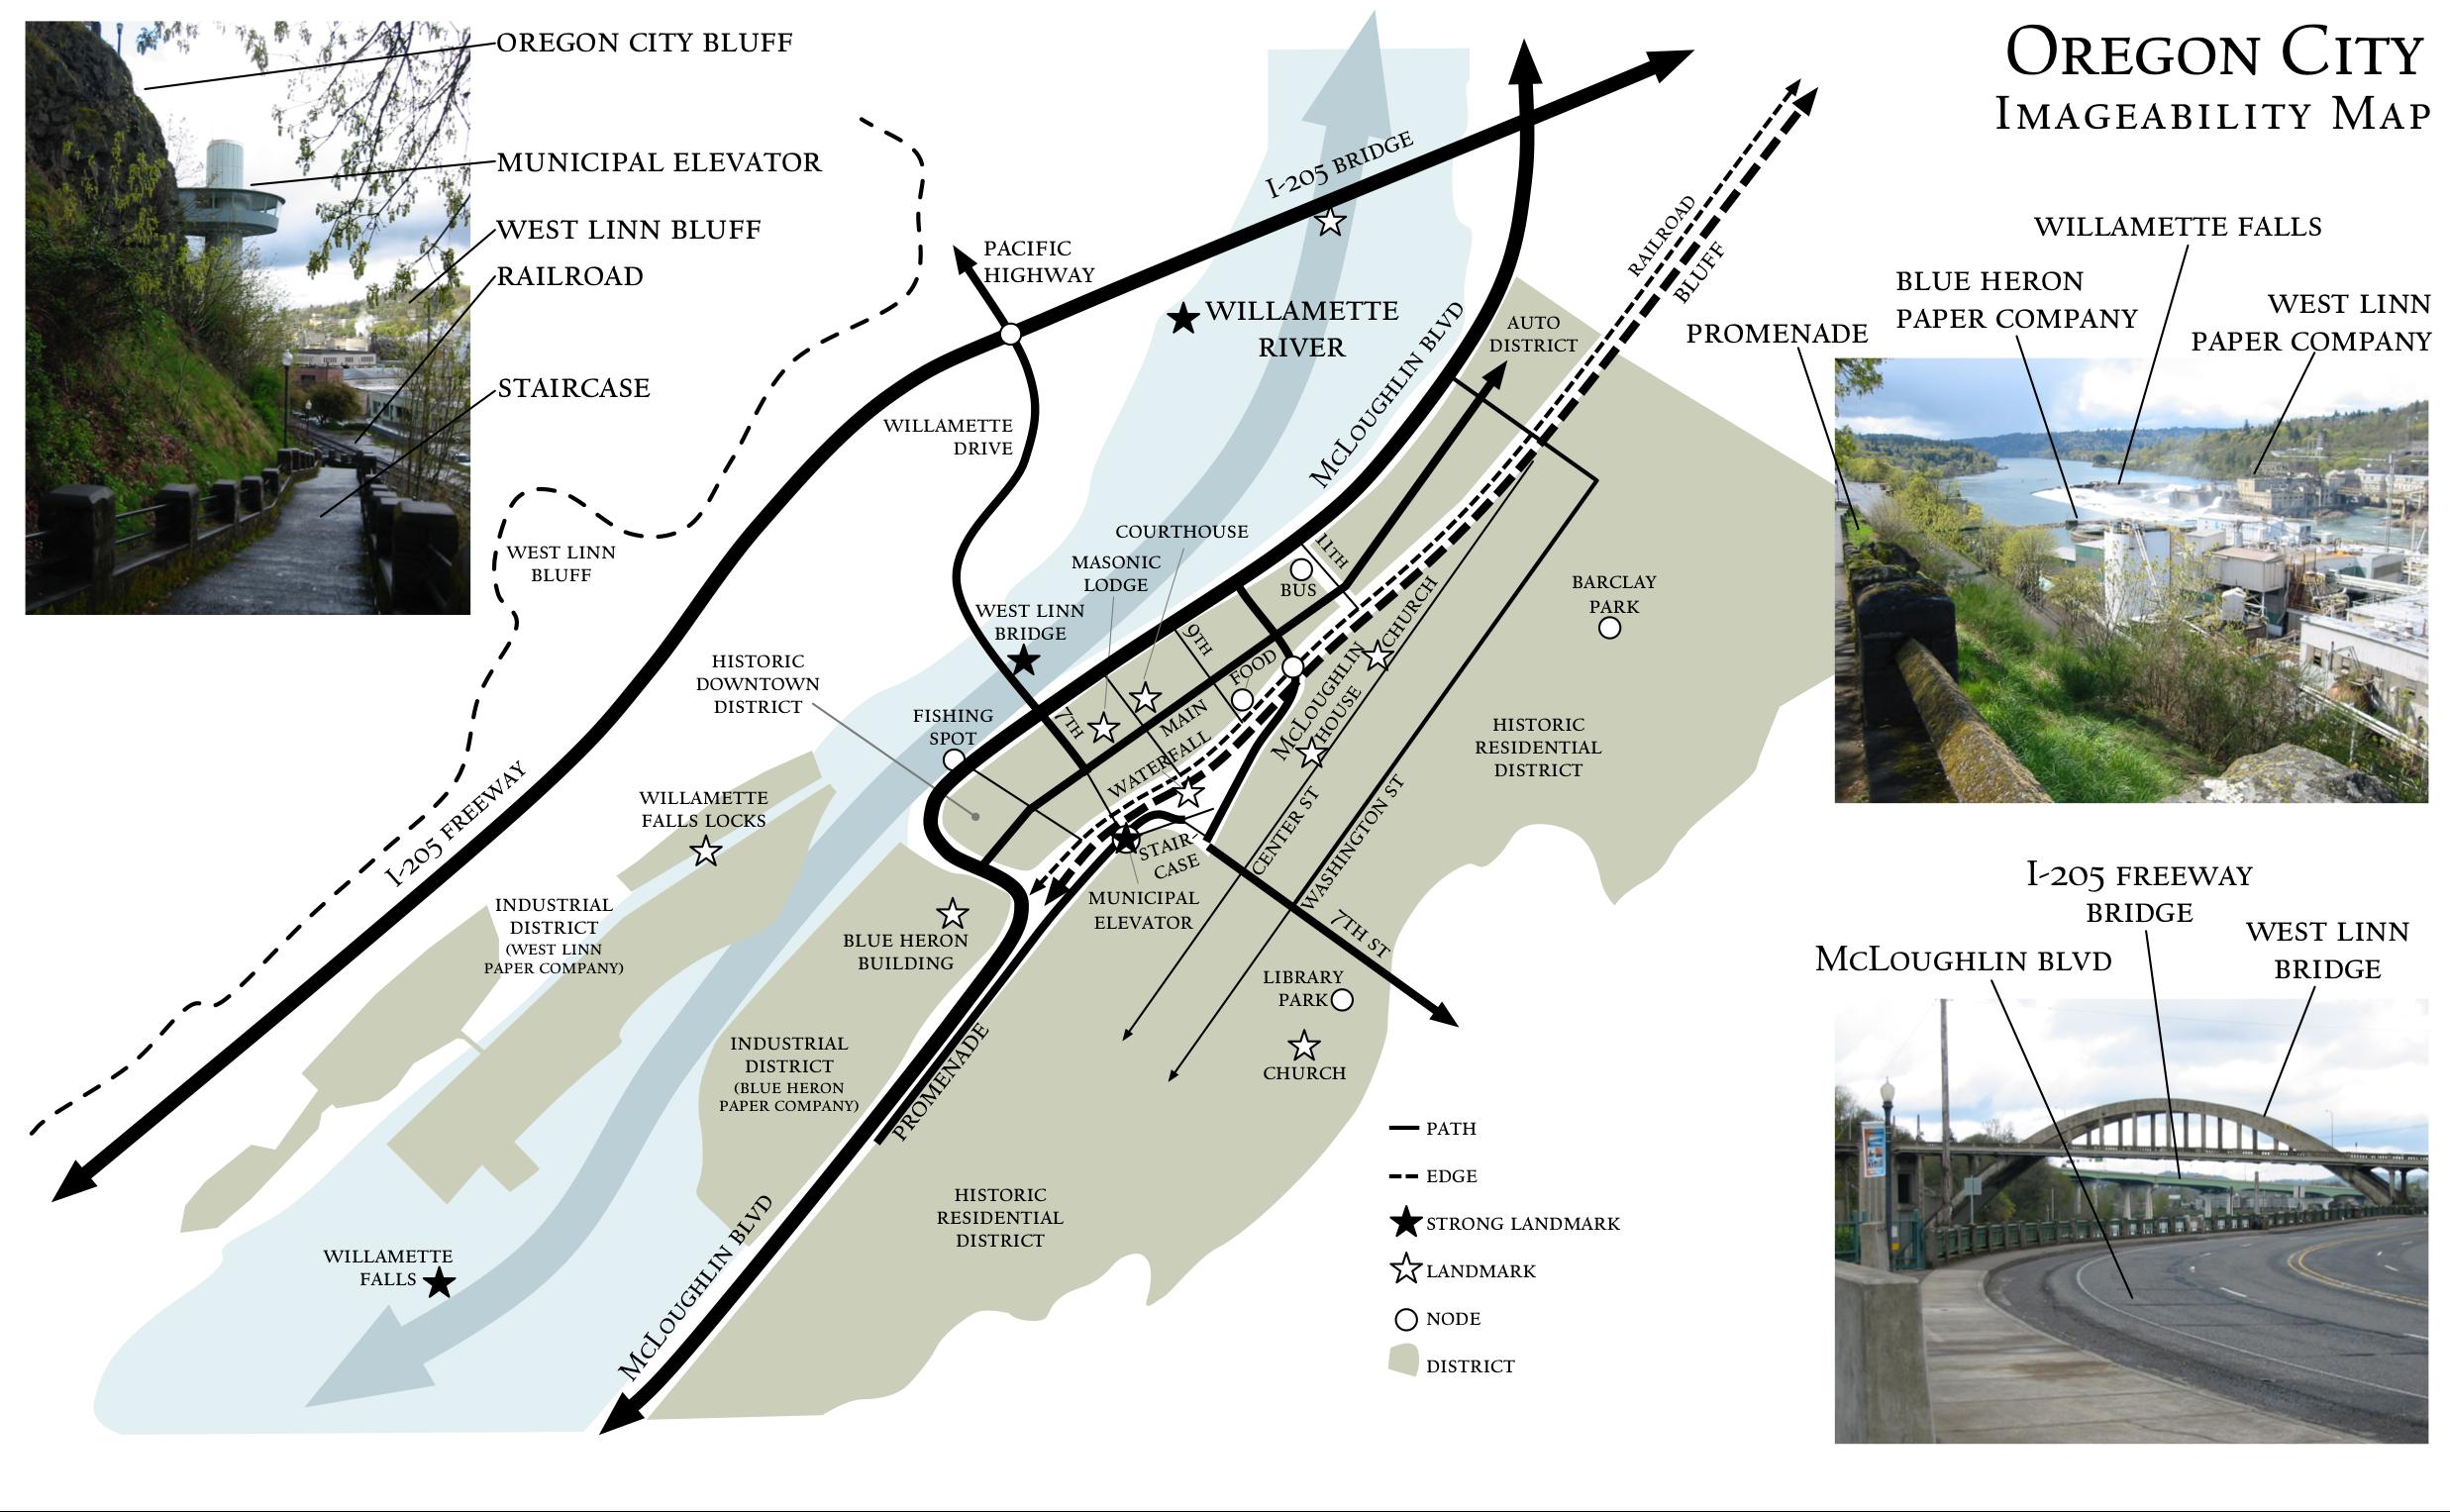 Oregon City imageability map